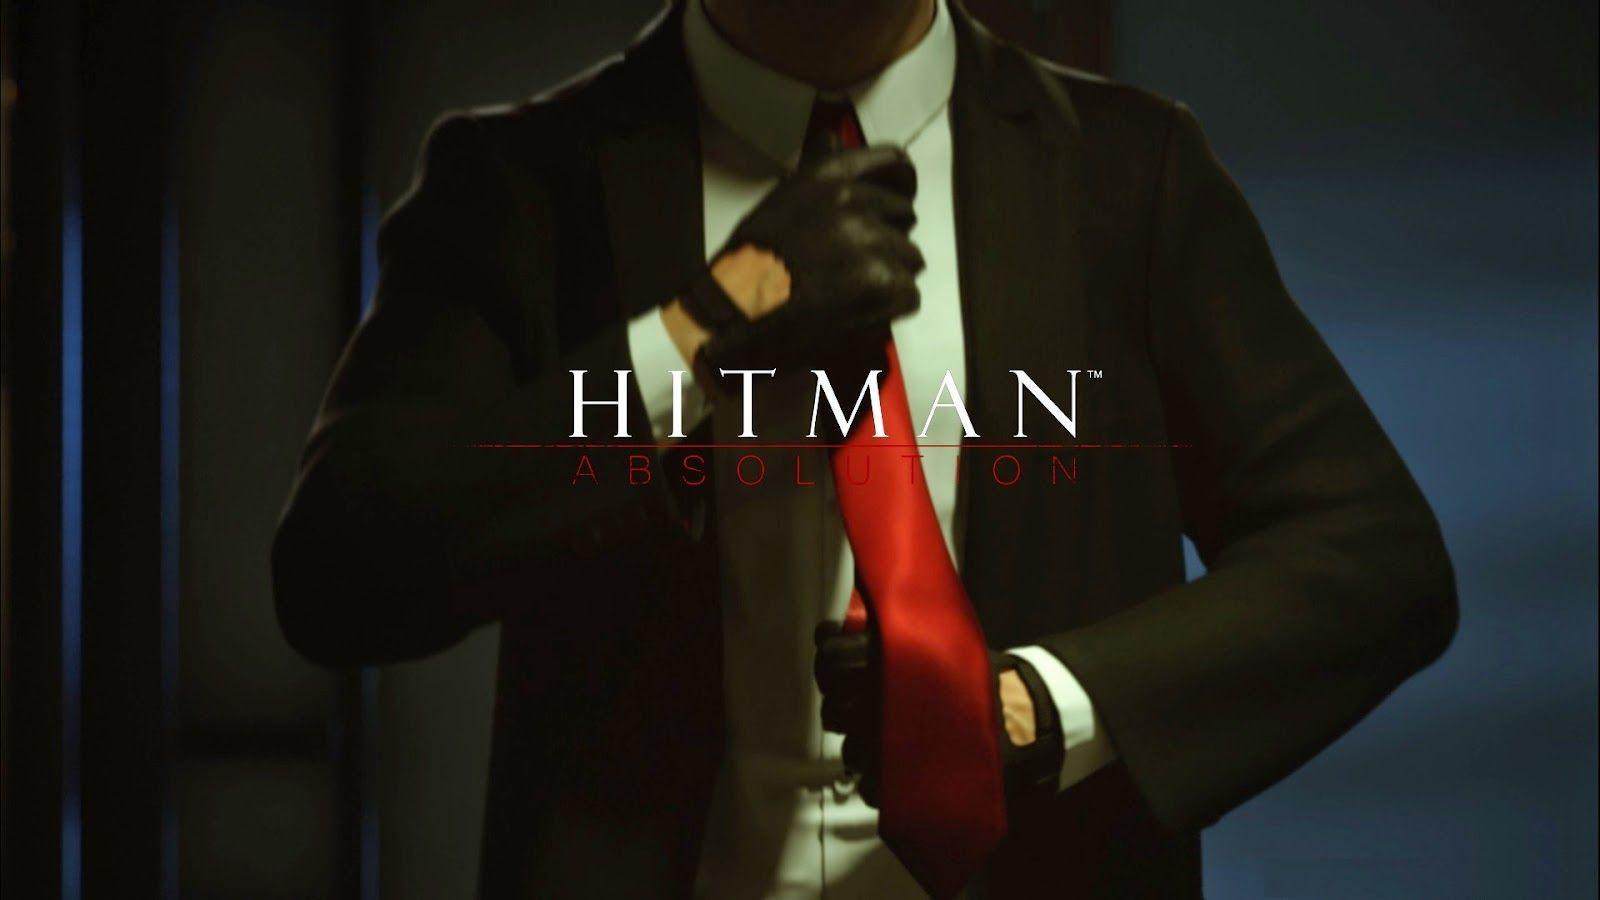 Hitman Full 4K Wallpapers - Top Free Hitman Full 4K